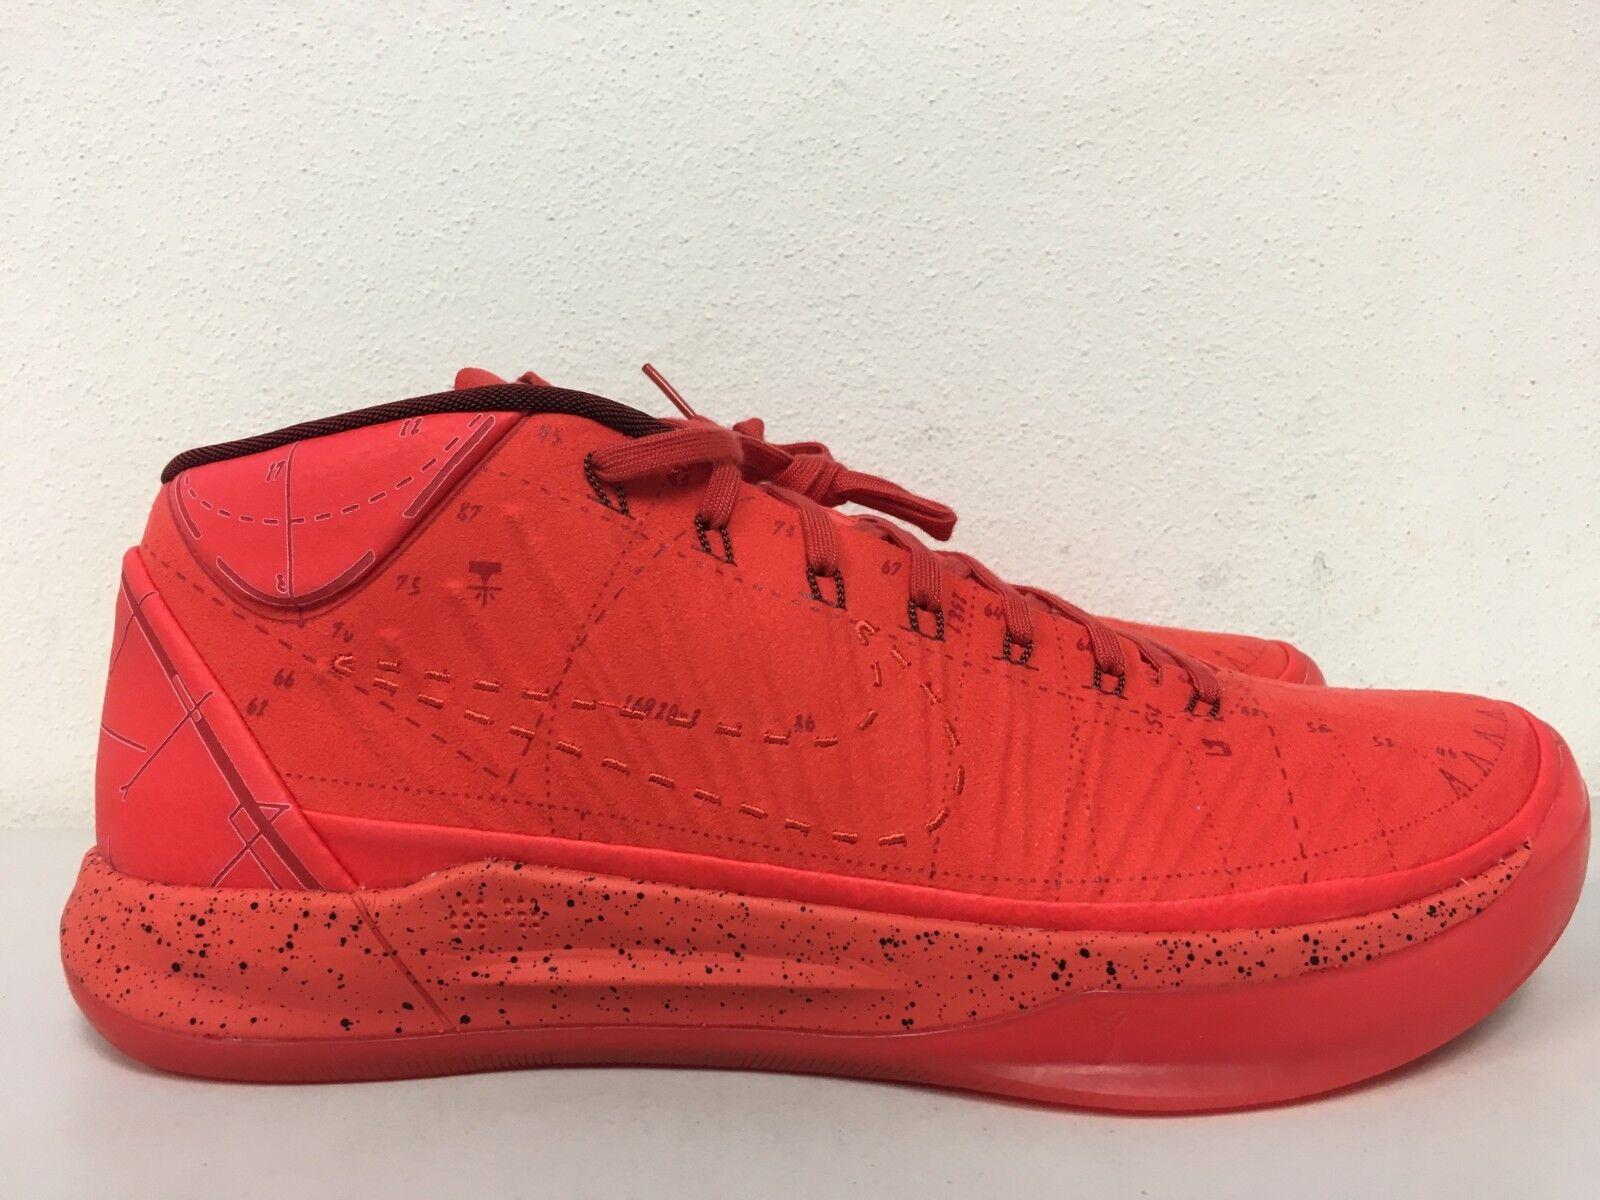 Nike Kobe AD Passion Mamba Mentality Habablack Red  Size 13.5